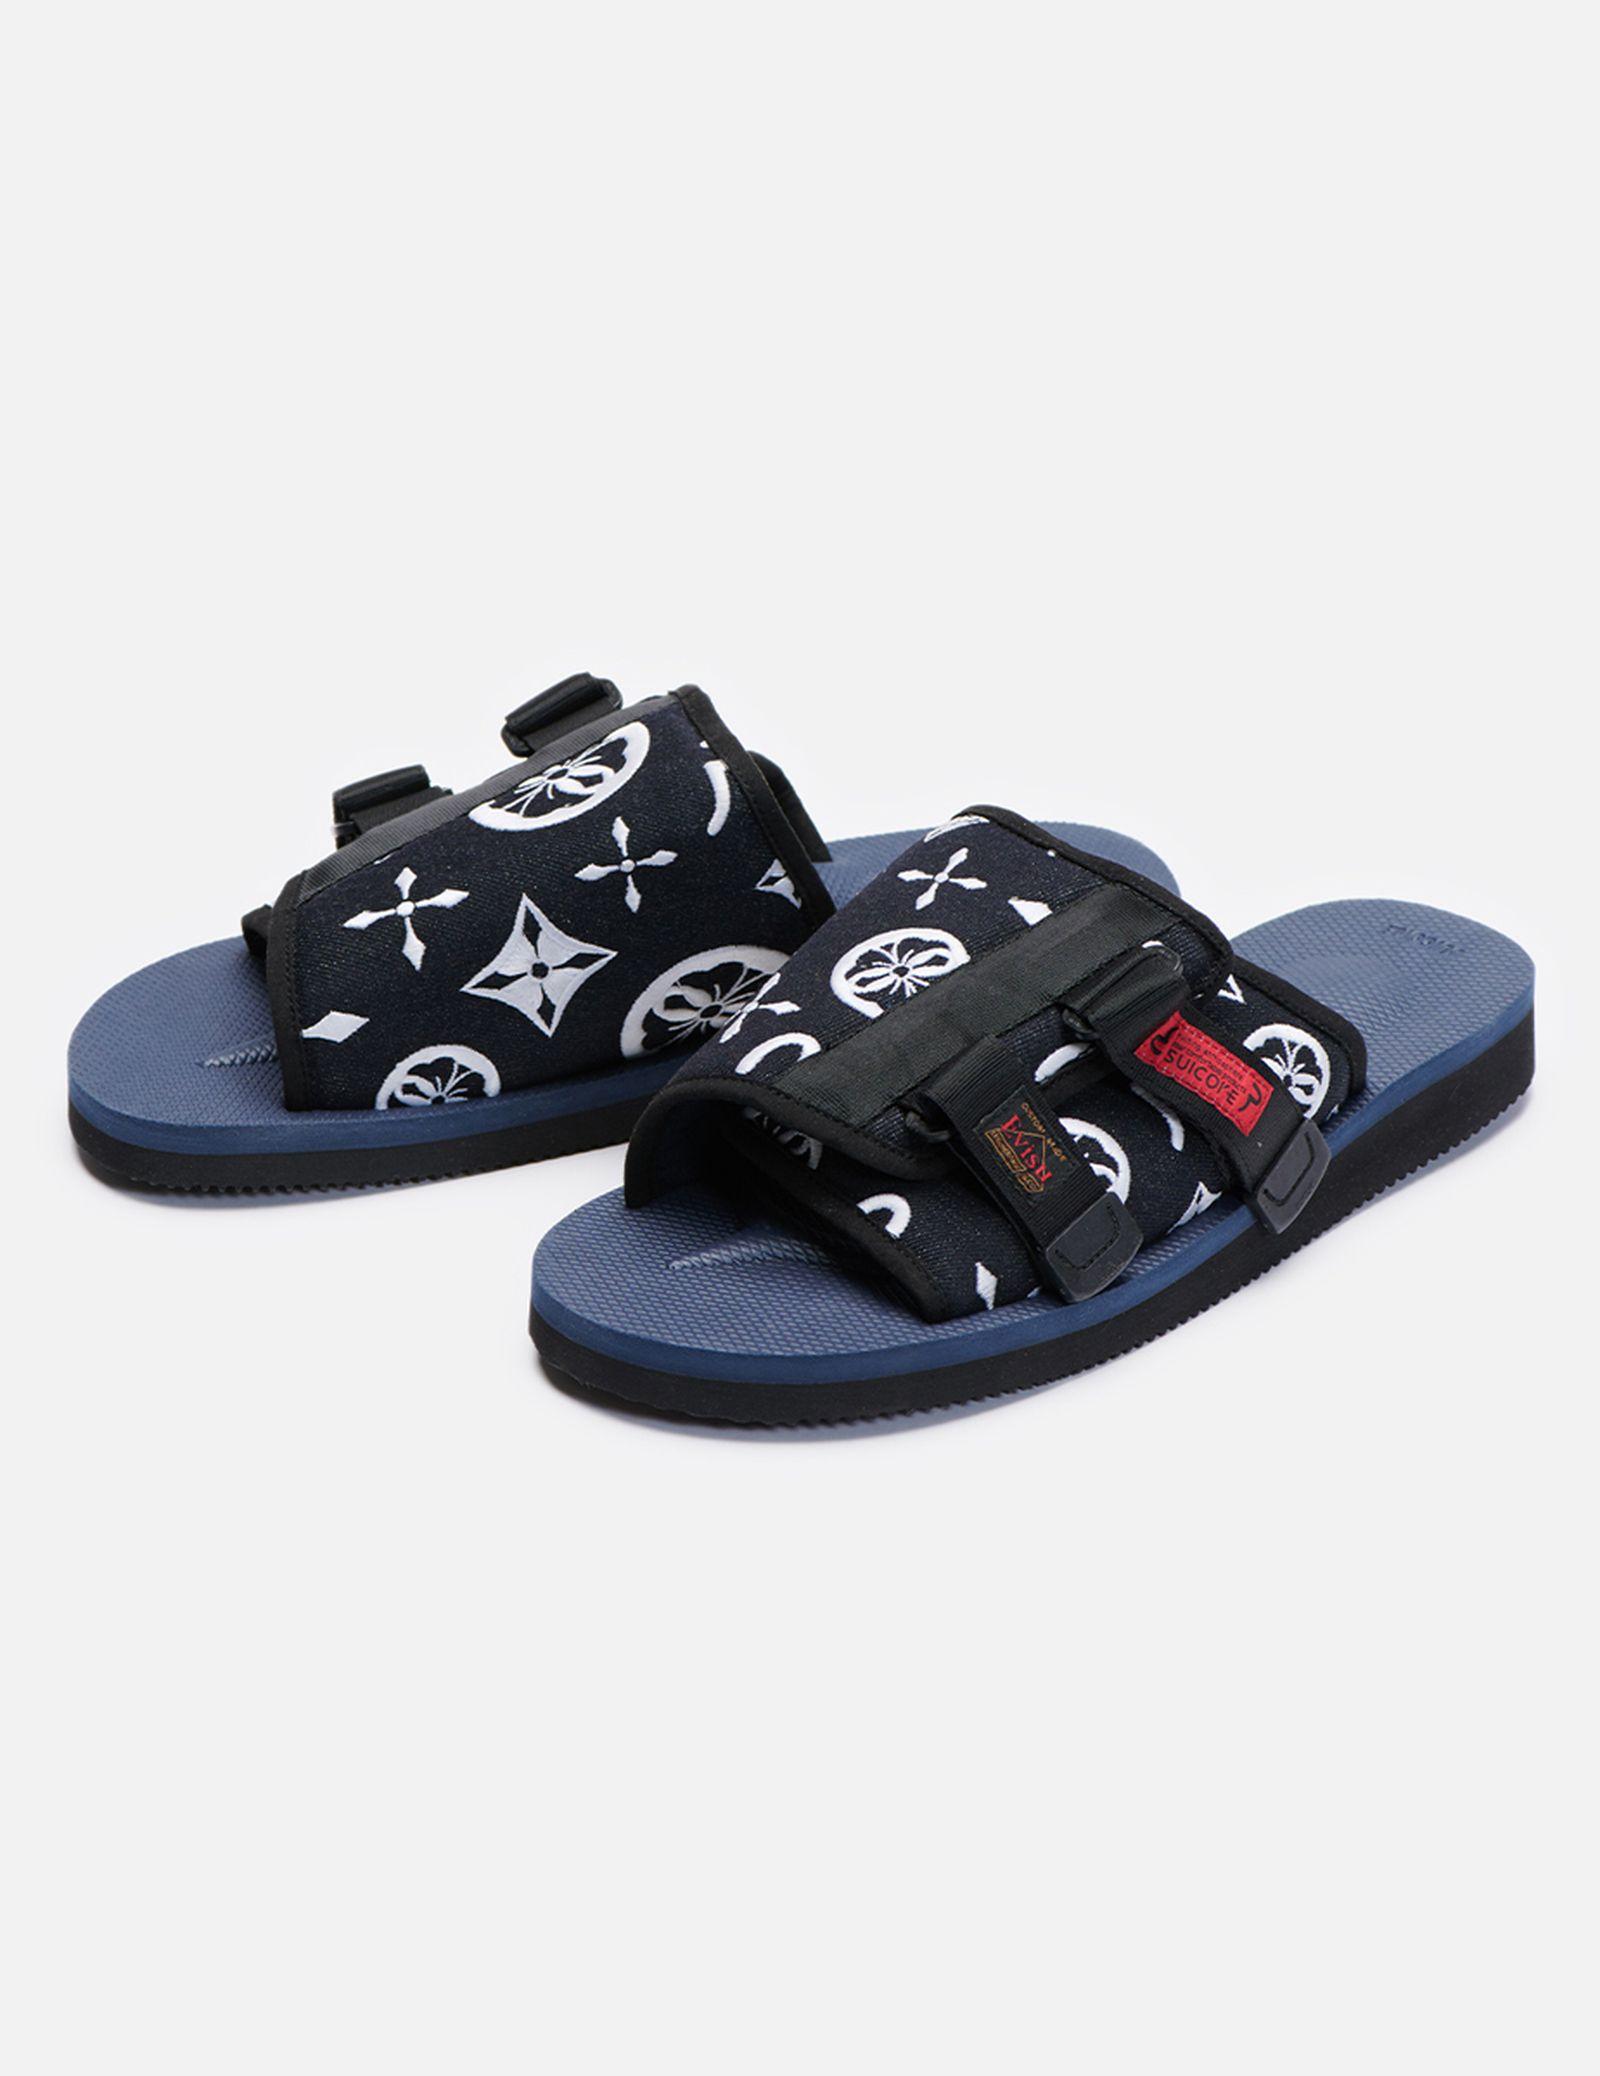 evisu-suicoke-denim-kaw-sandal-collab- (10)